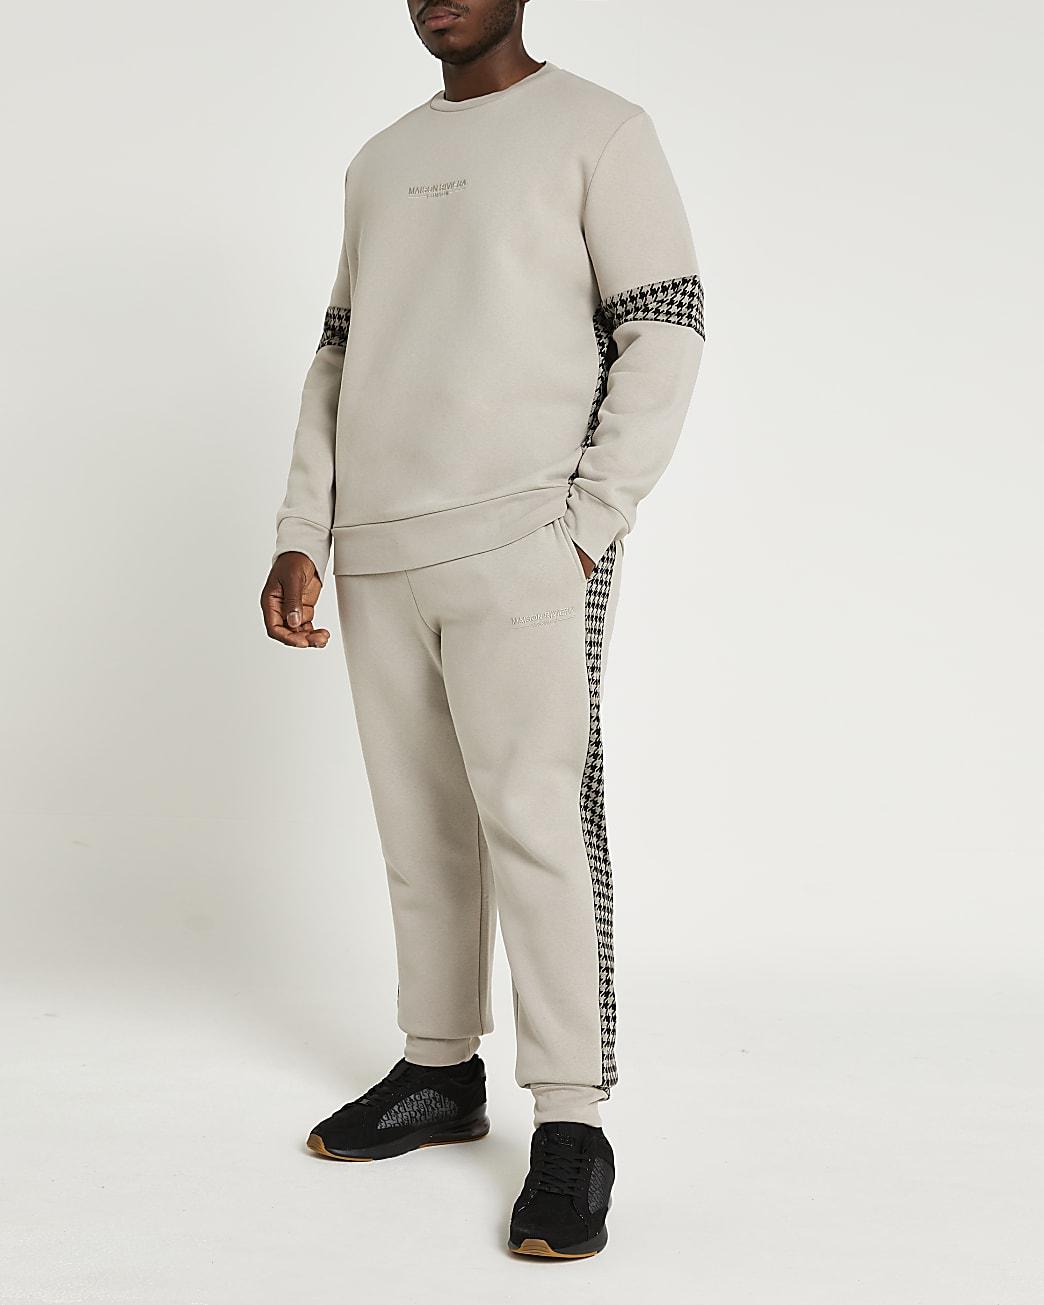 Big & tall Maison Riviera grey sweatshirt